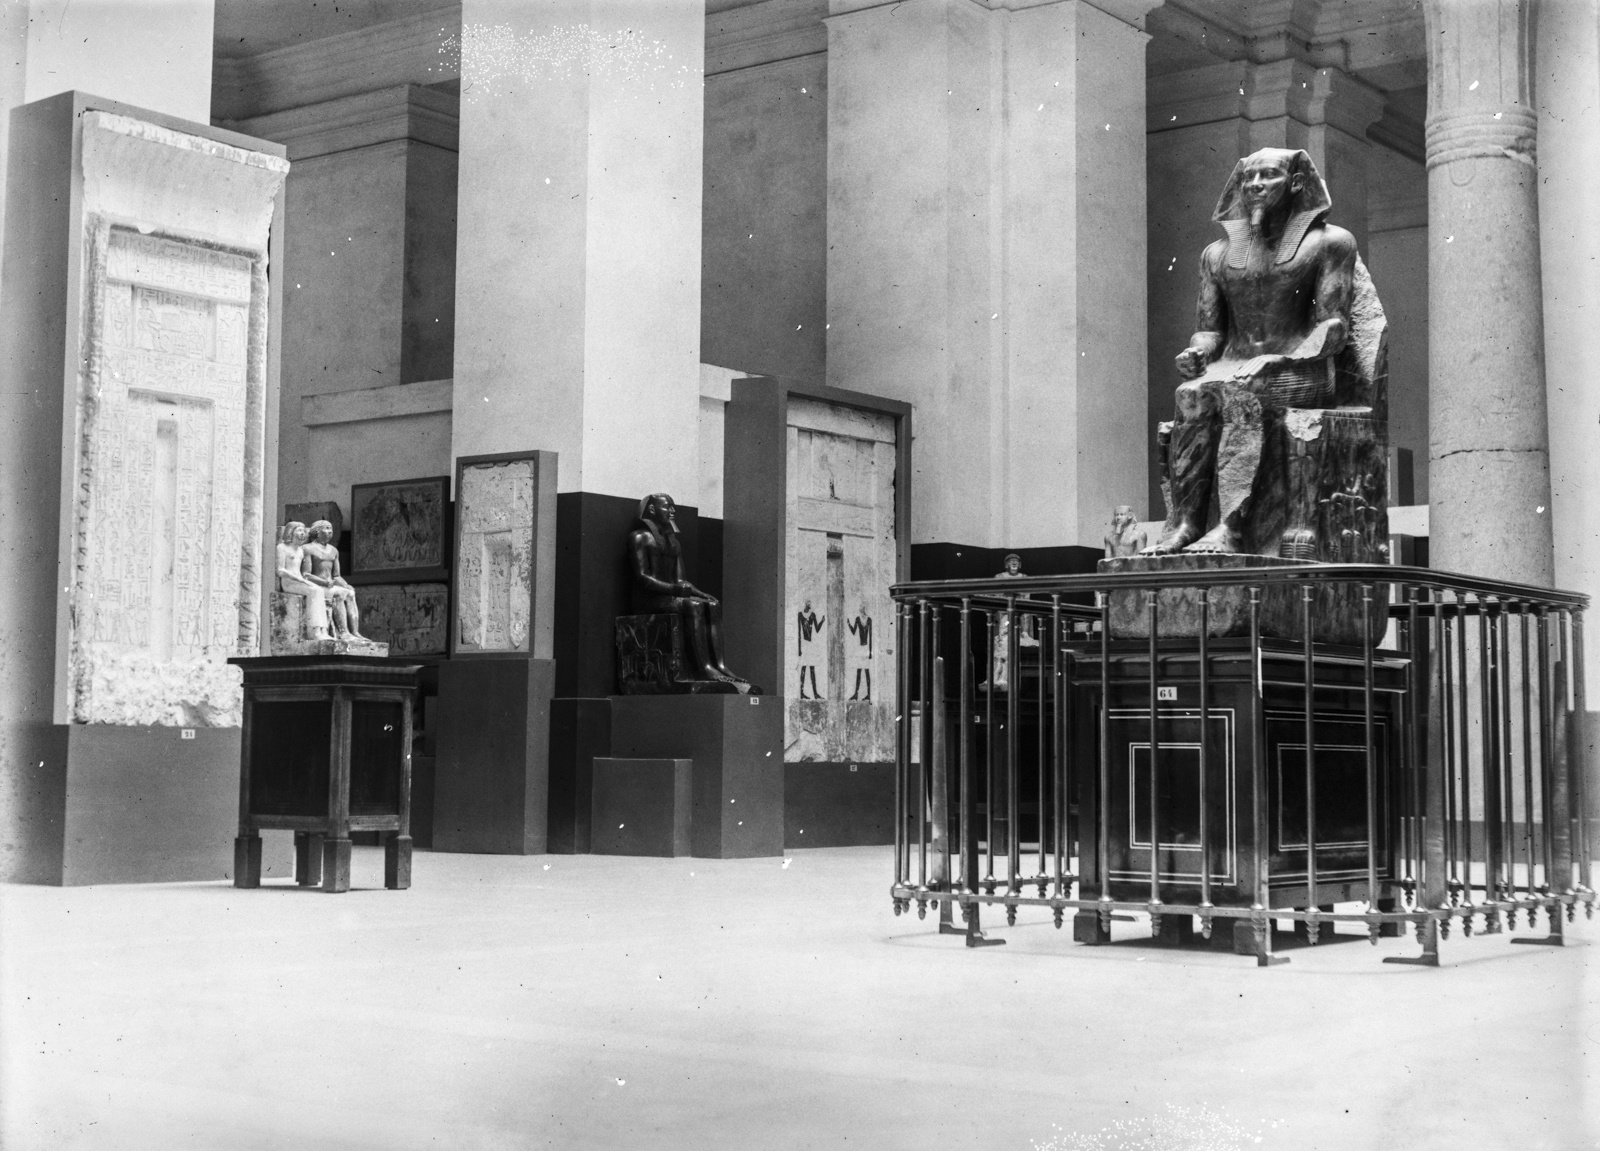 Статуя фараона Хефрена в Египетском музее в Каире